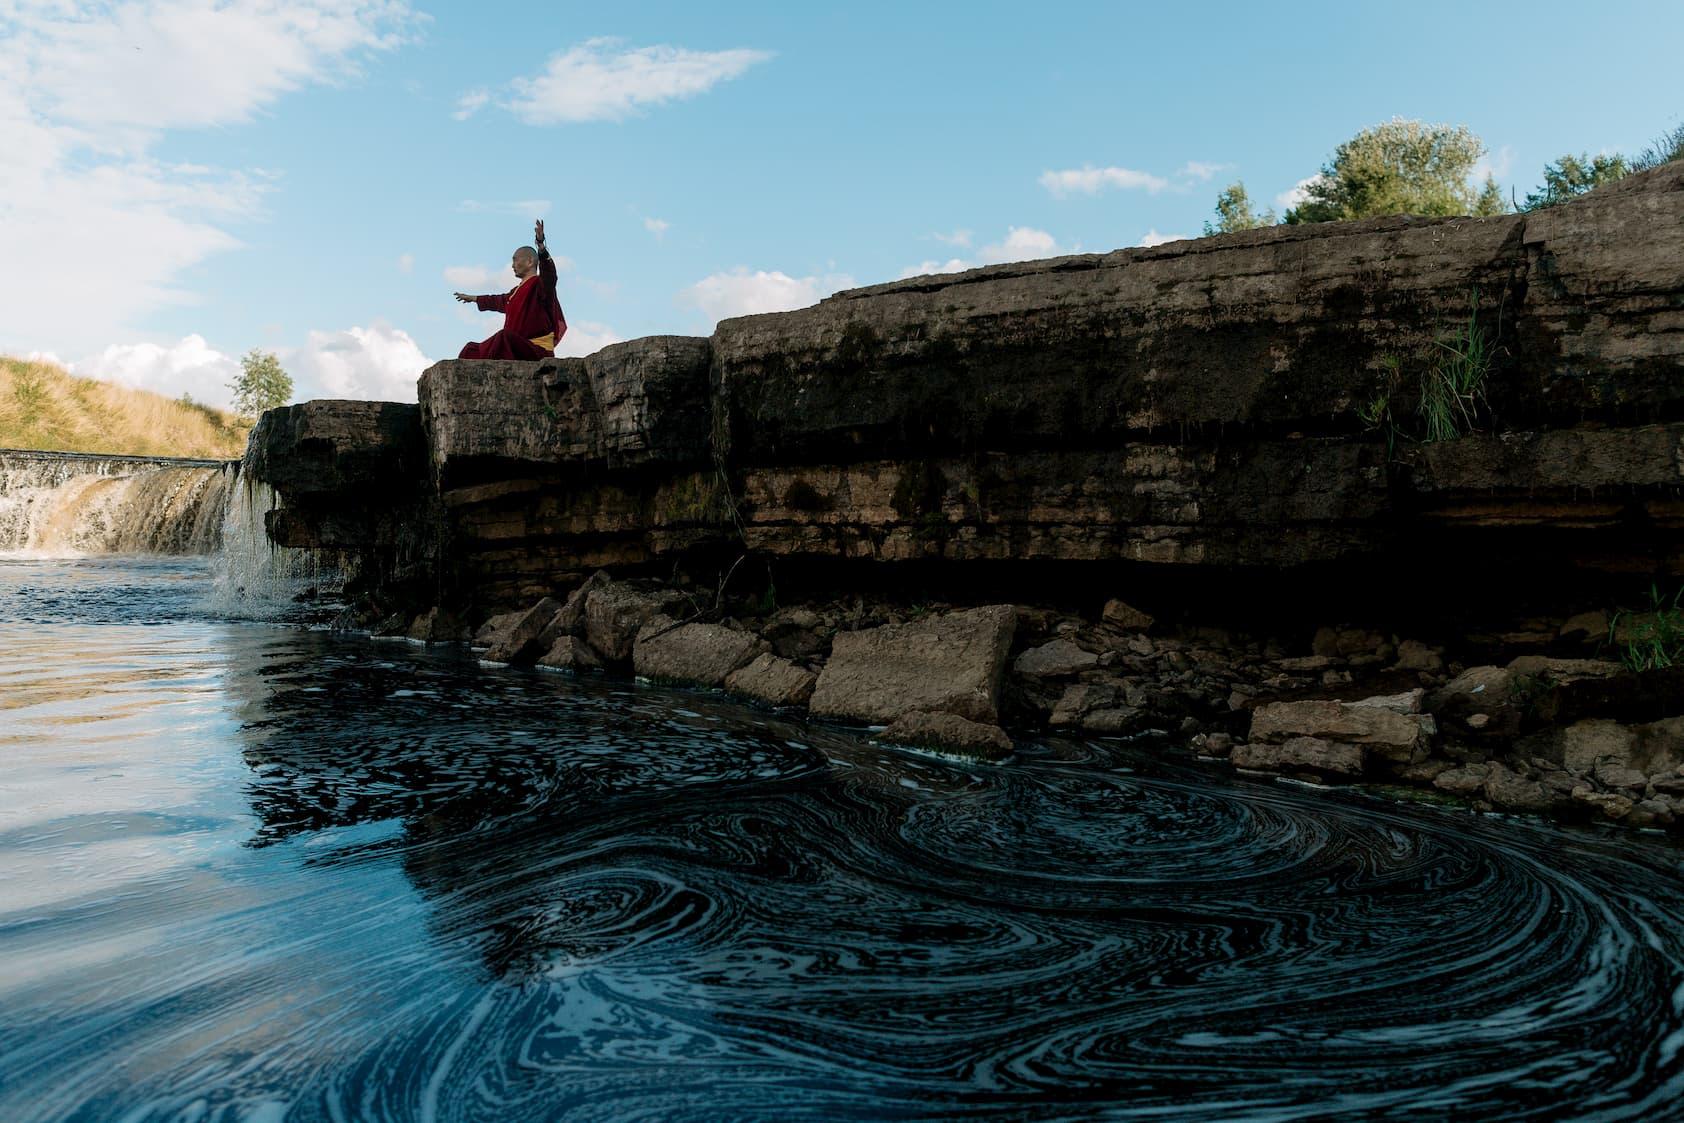 respiration relaxation meditation